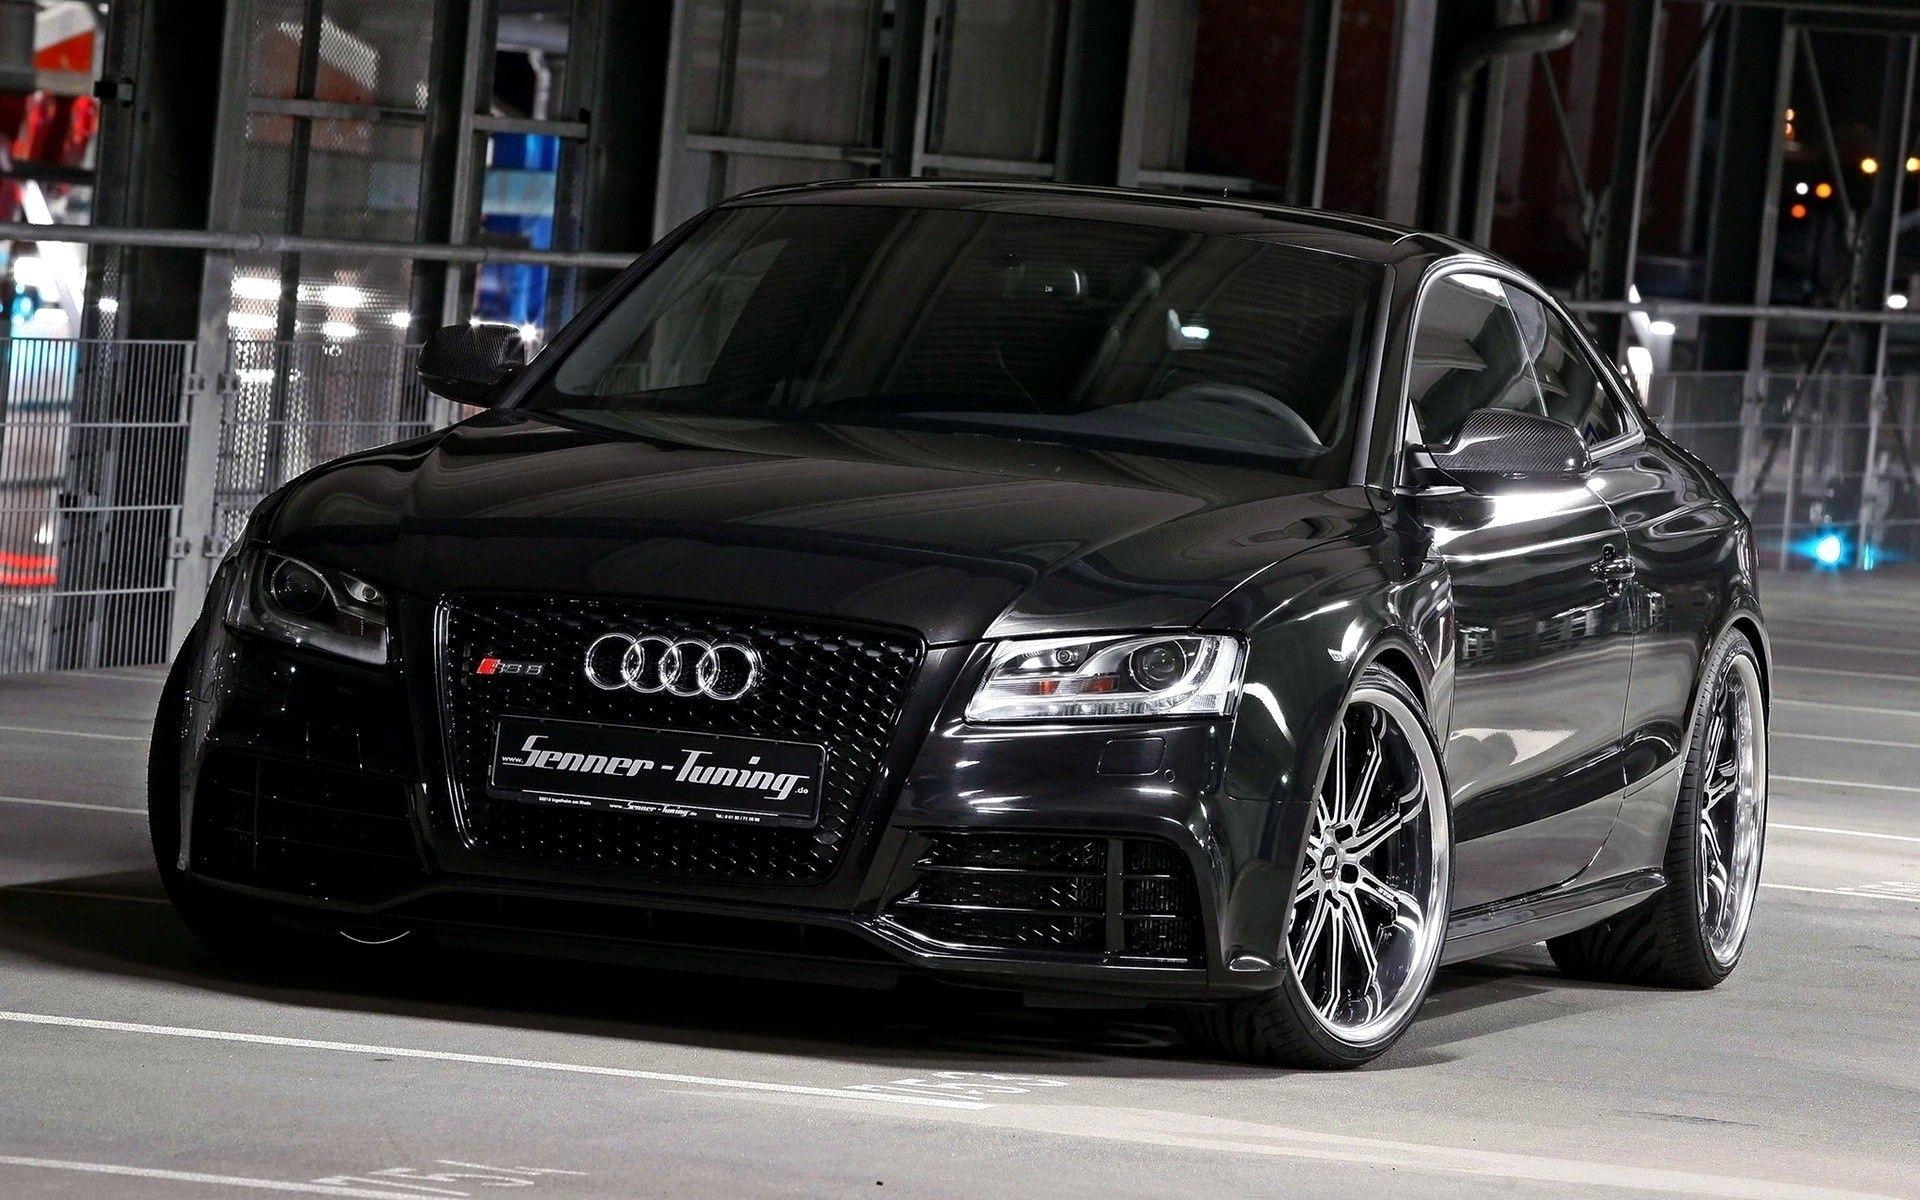 Audi S Hd Wallpaper Audi S Hd Wallpaper Audi illinoisliver